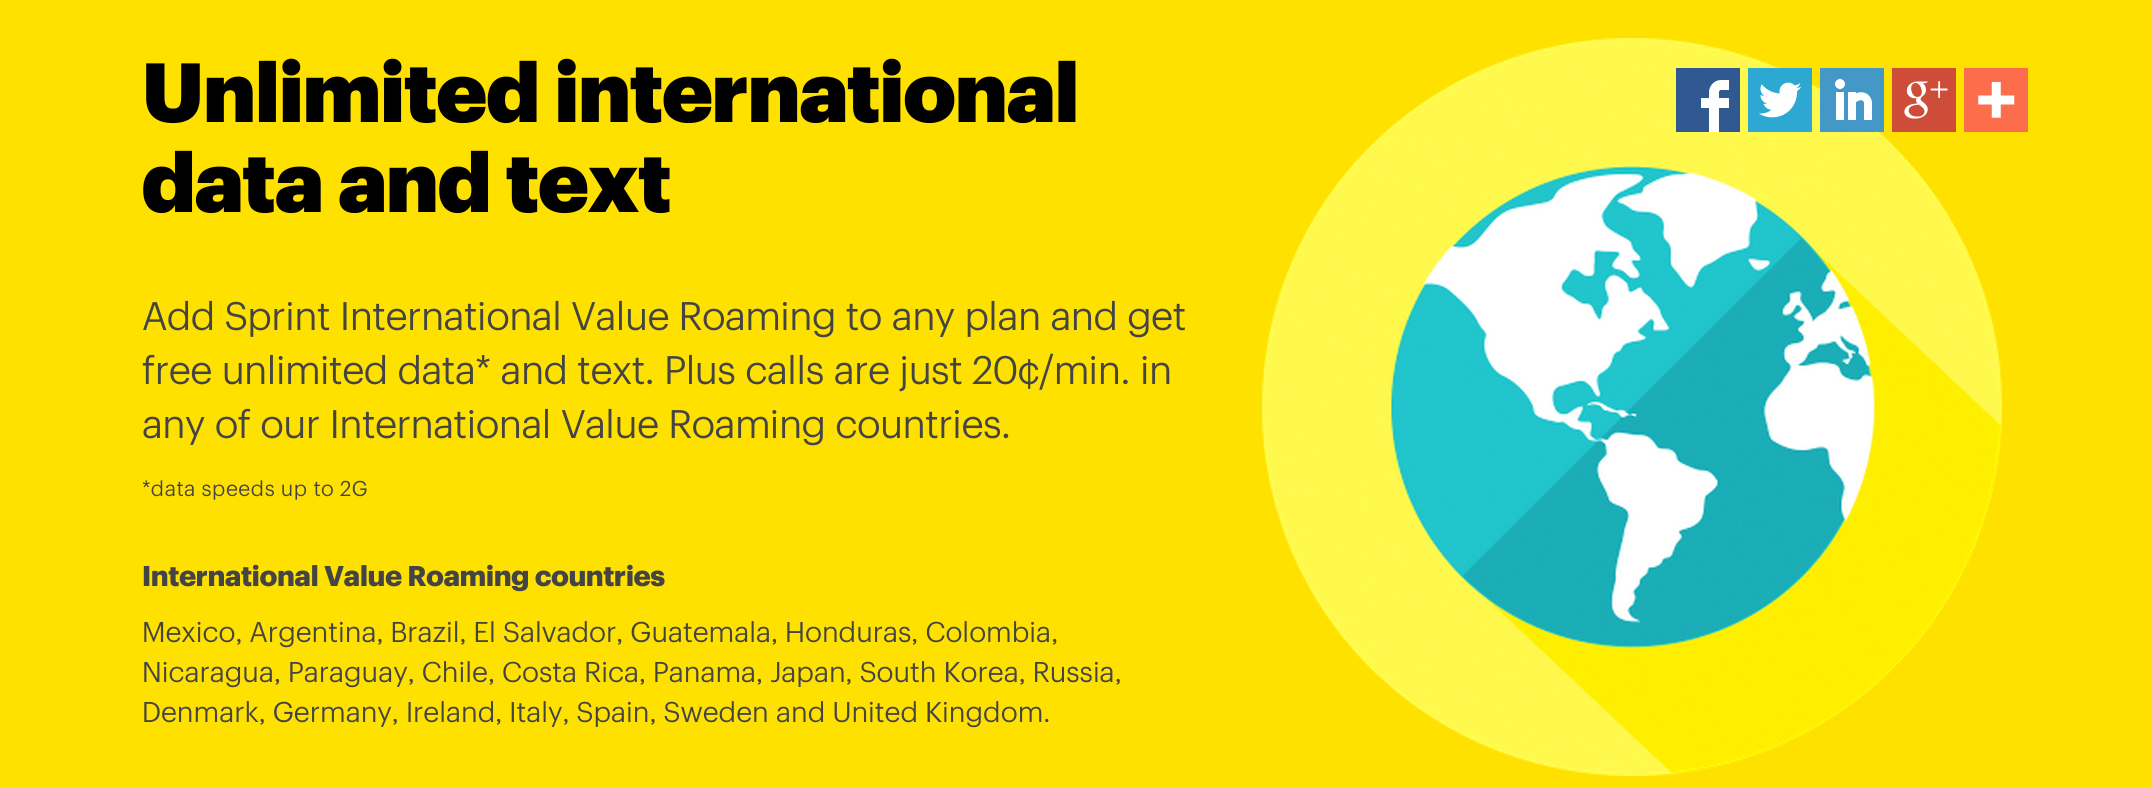 At T Data Plan For International Travel